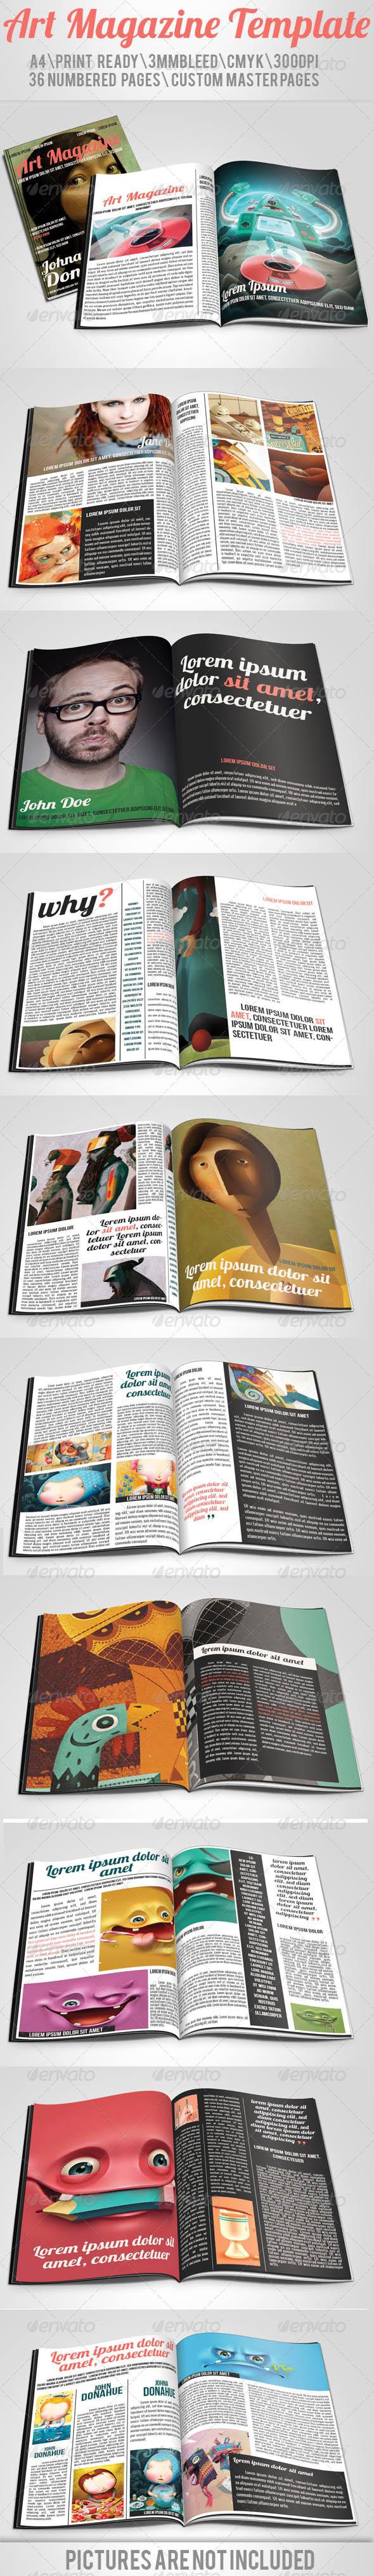 Art Magazine Template - Magazines Print Templates